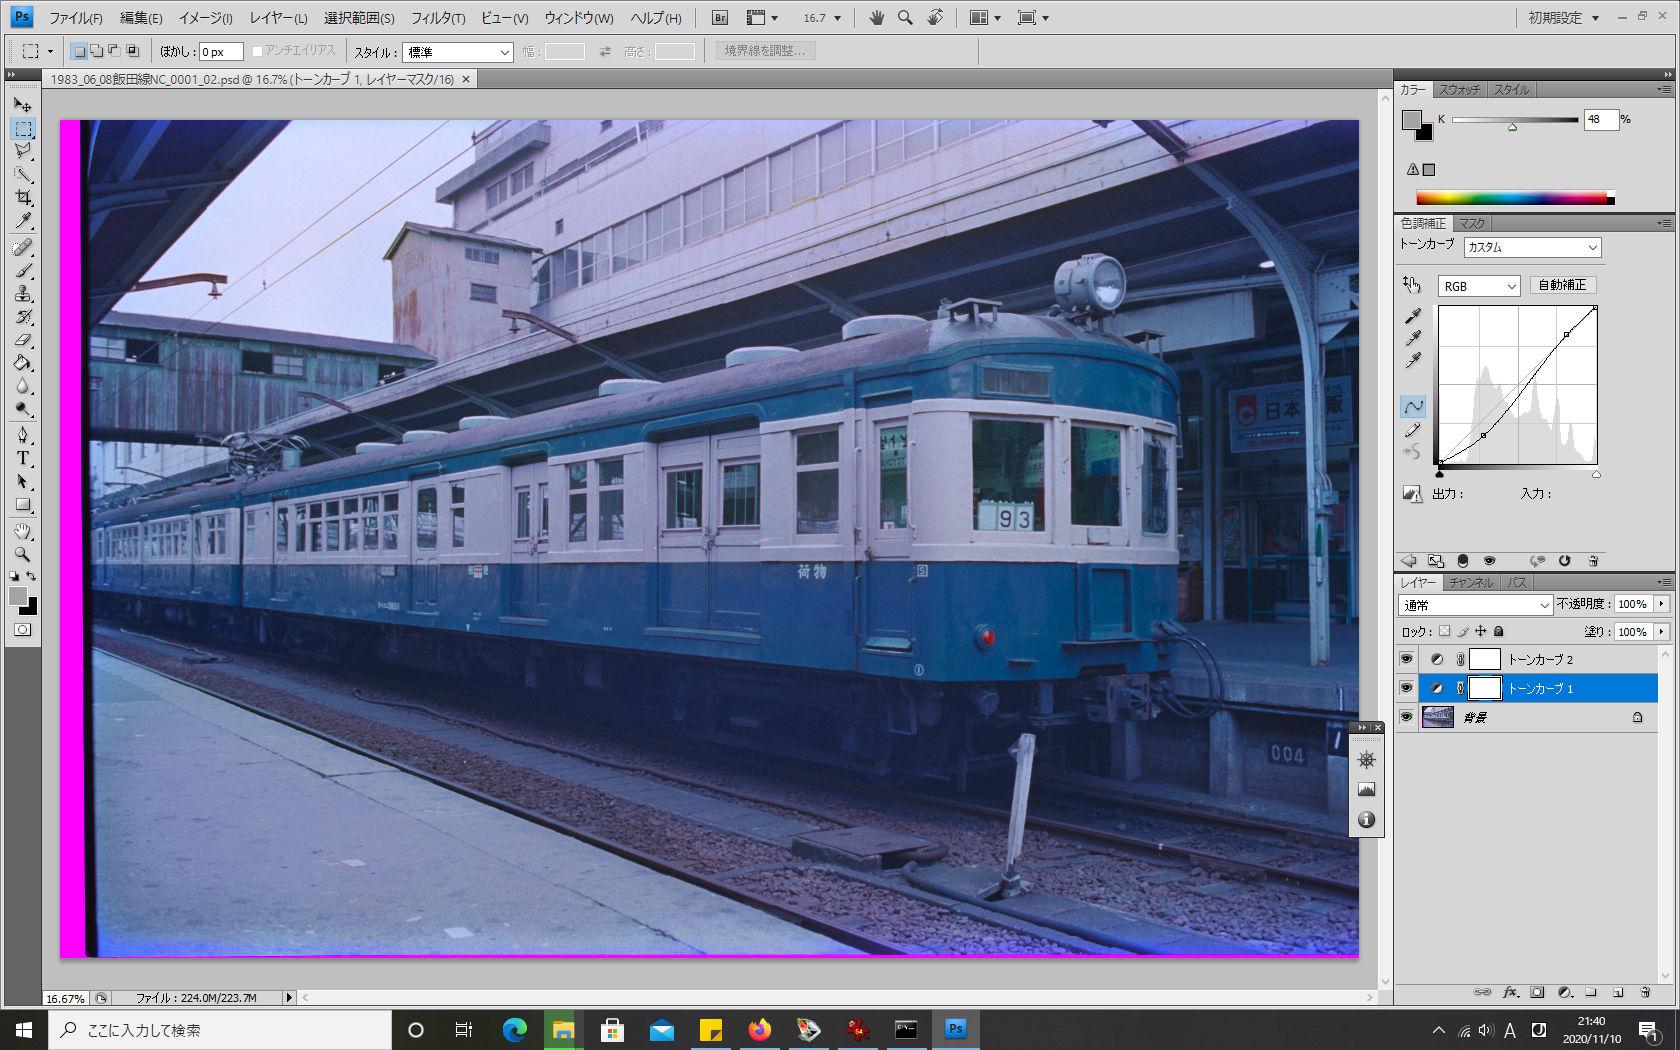 f:id:yasuo_ssi:20201110215545j:plain